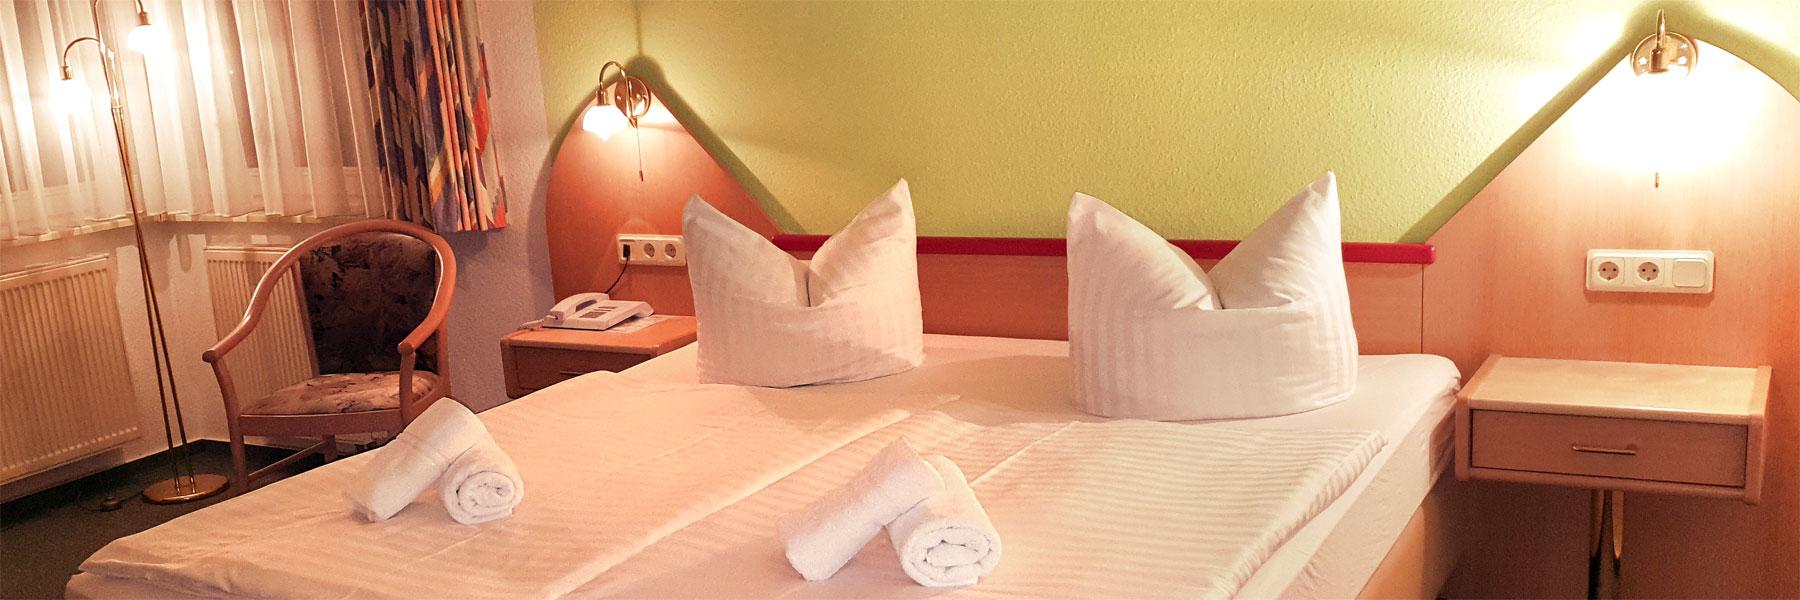 Doppelzimmer - Hotel Jahnke